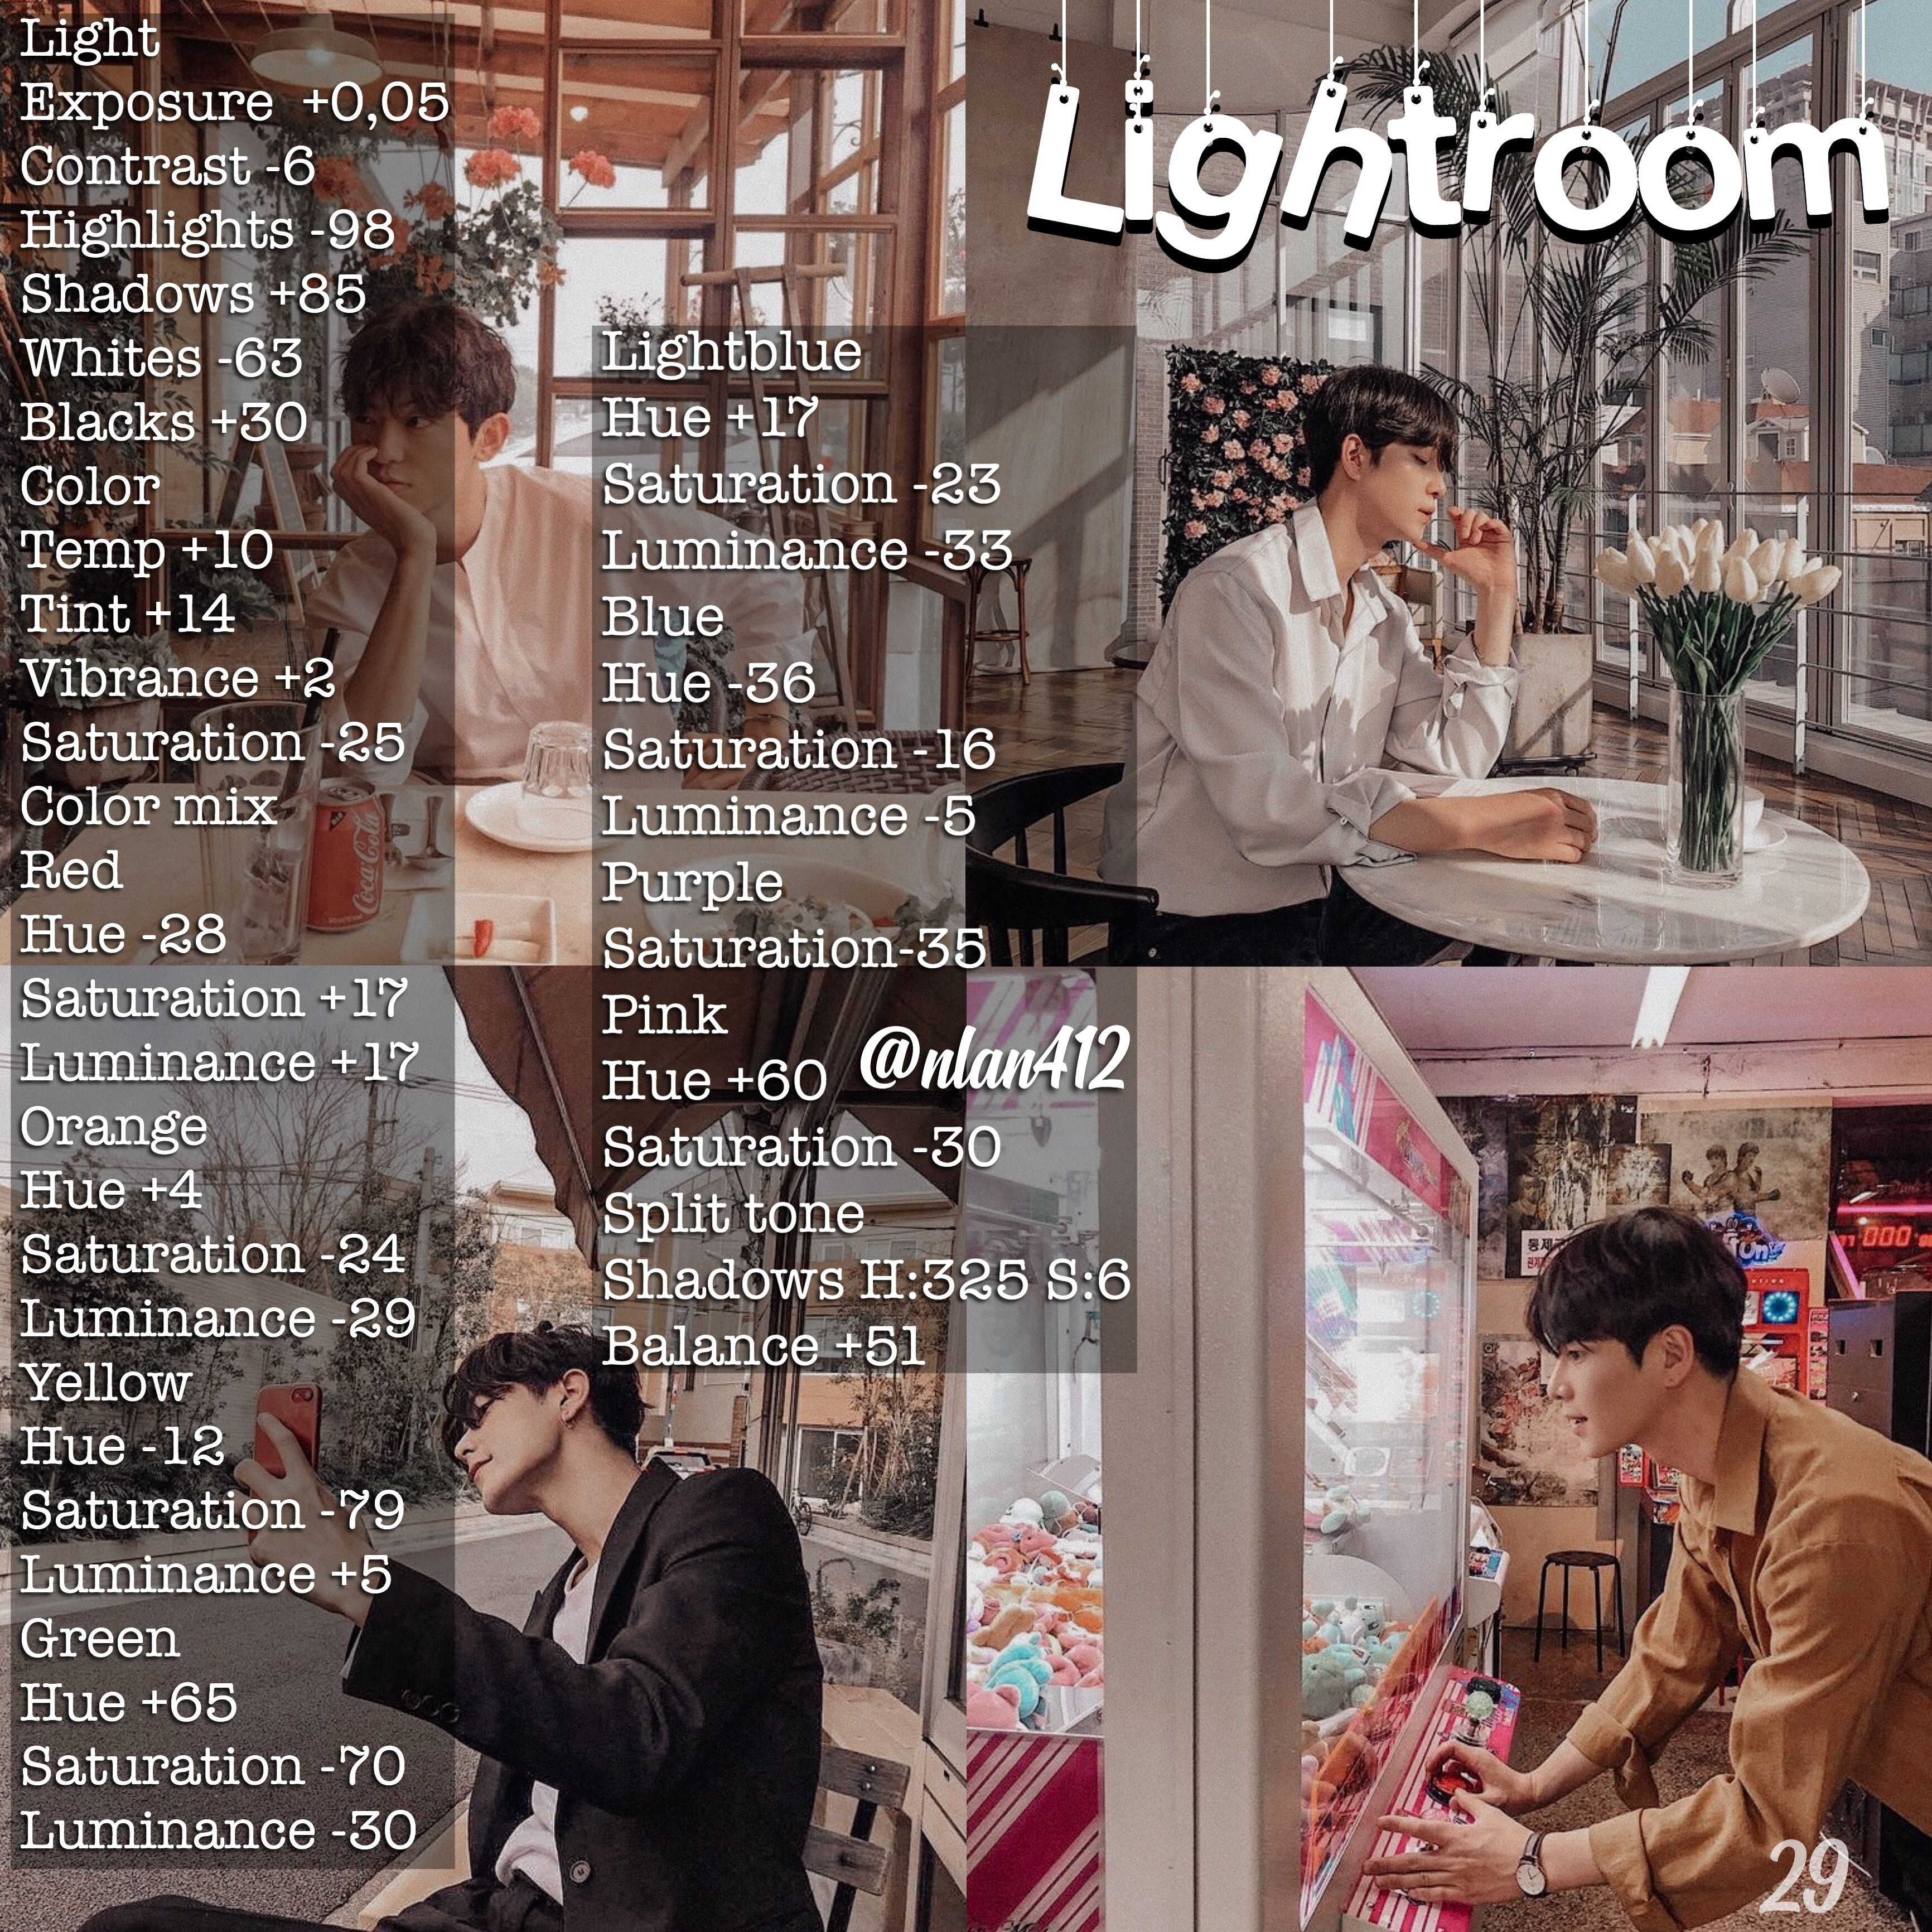 Lightroom Follow Me Save Read Lightroom Tutorial Photo Editing Lightroom Editing Tutorials Lightroom Presets Tutorial